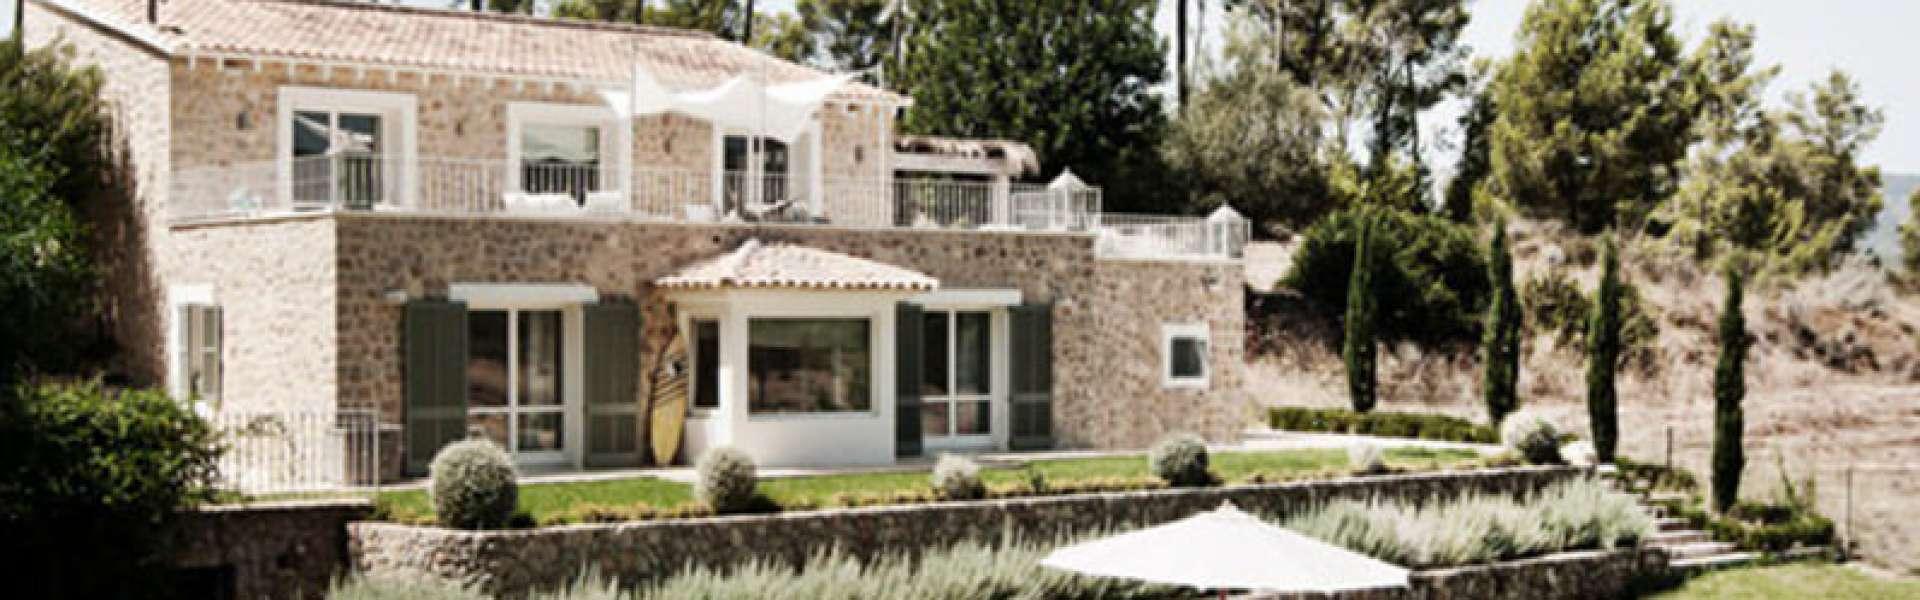 Calvia - Natursteinfinca im modernen Stil